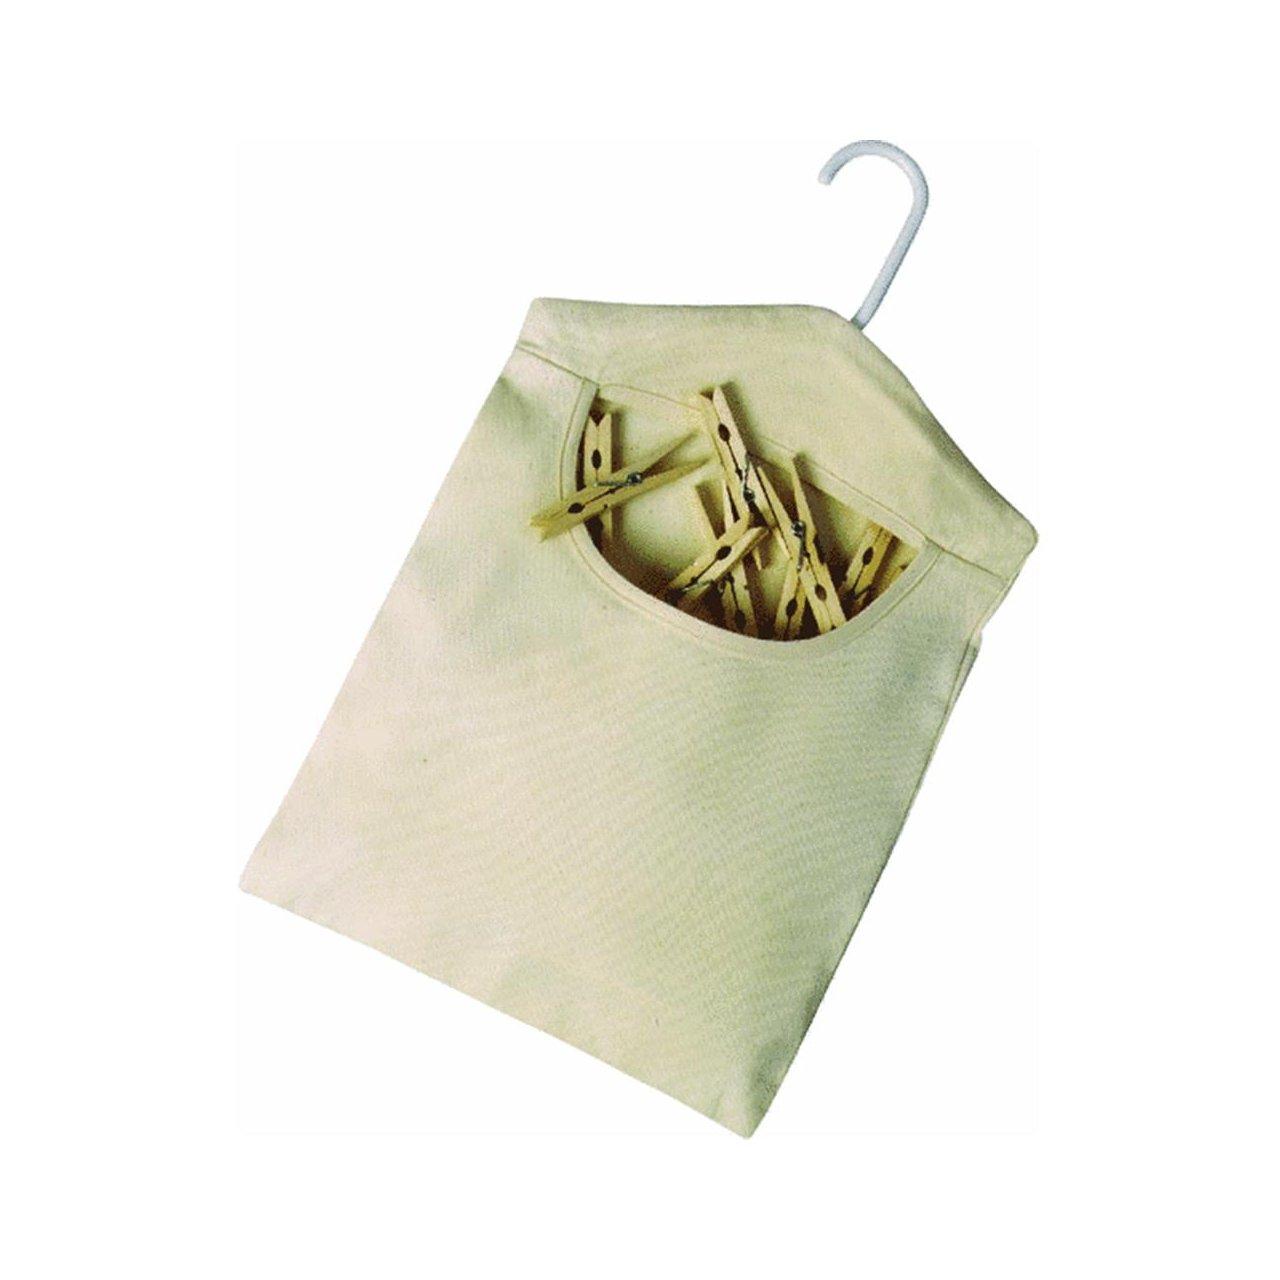 Homz/Seymour 1220049 11X15 Clothespin Bag FBA_1220049